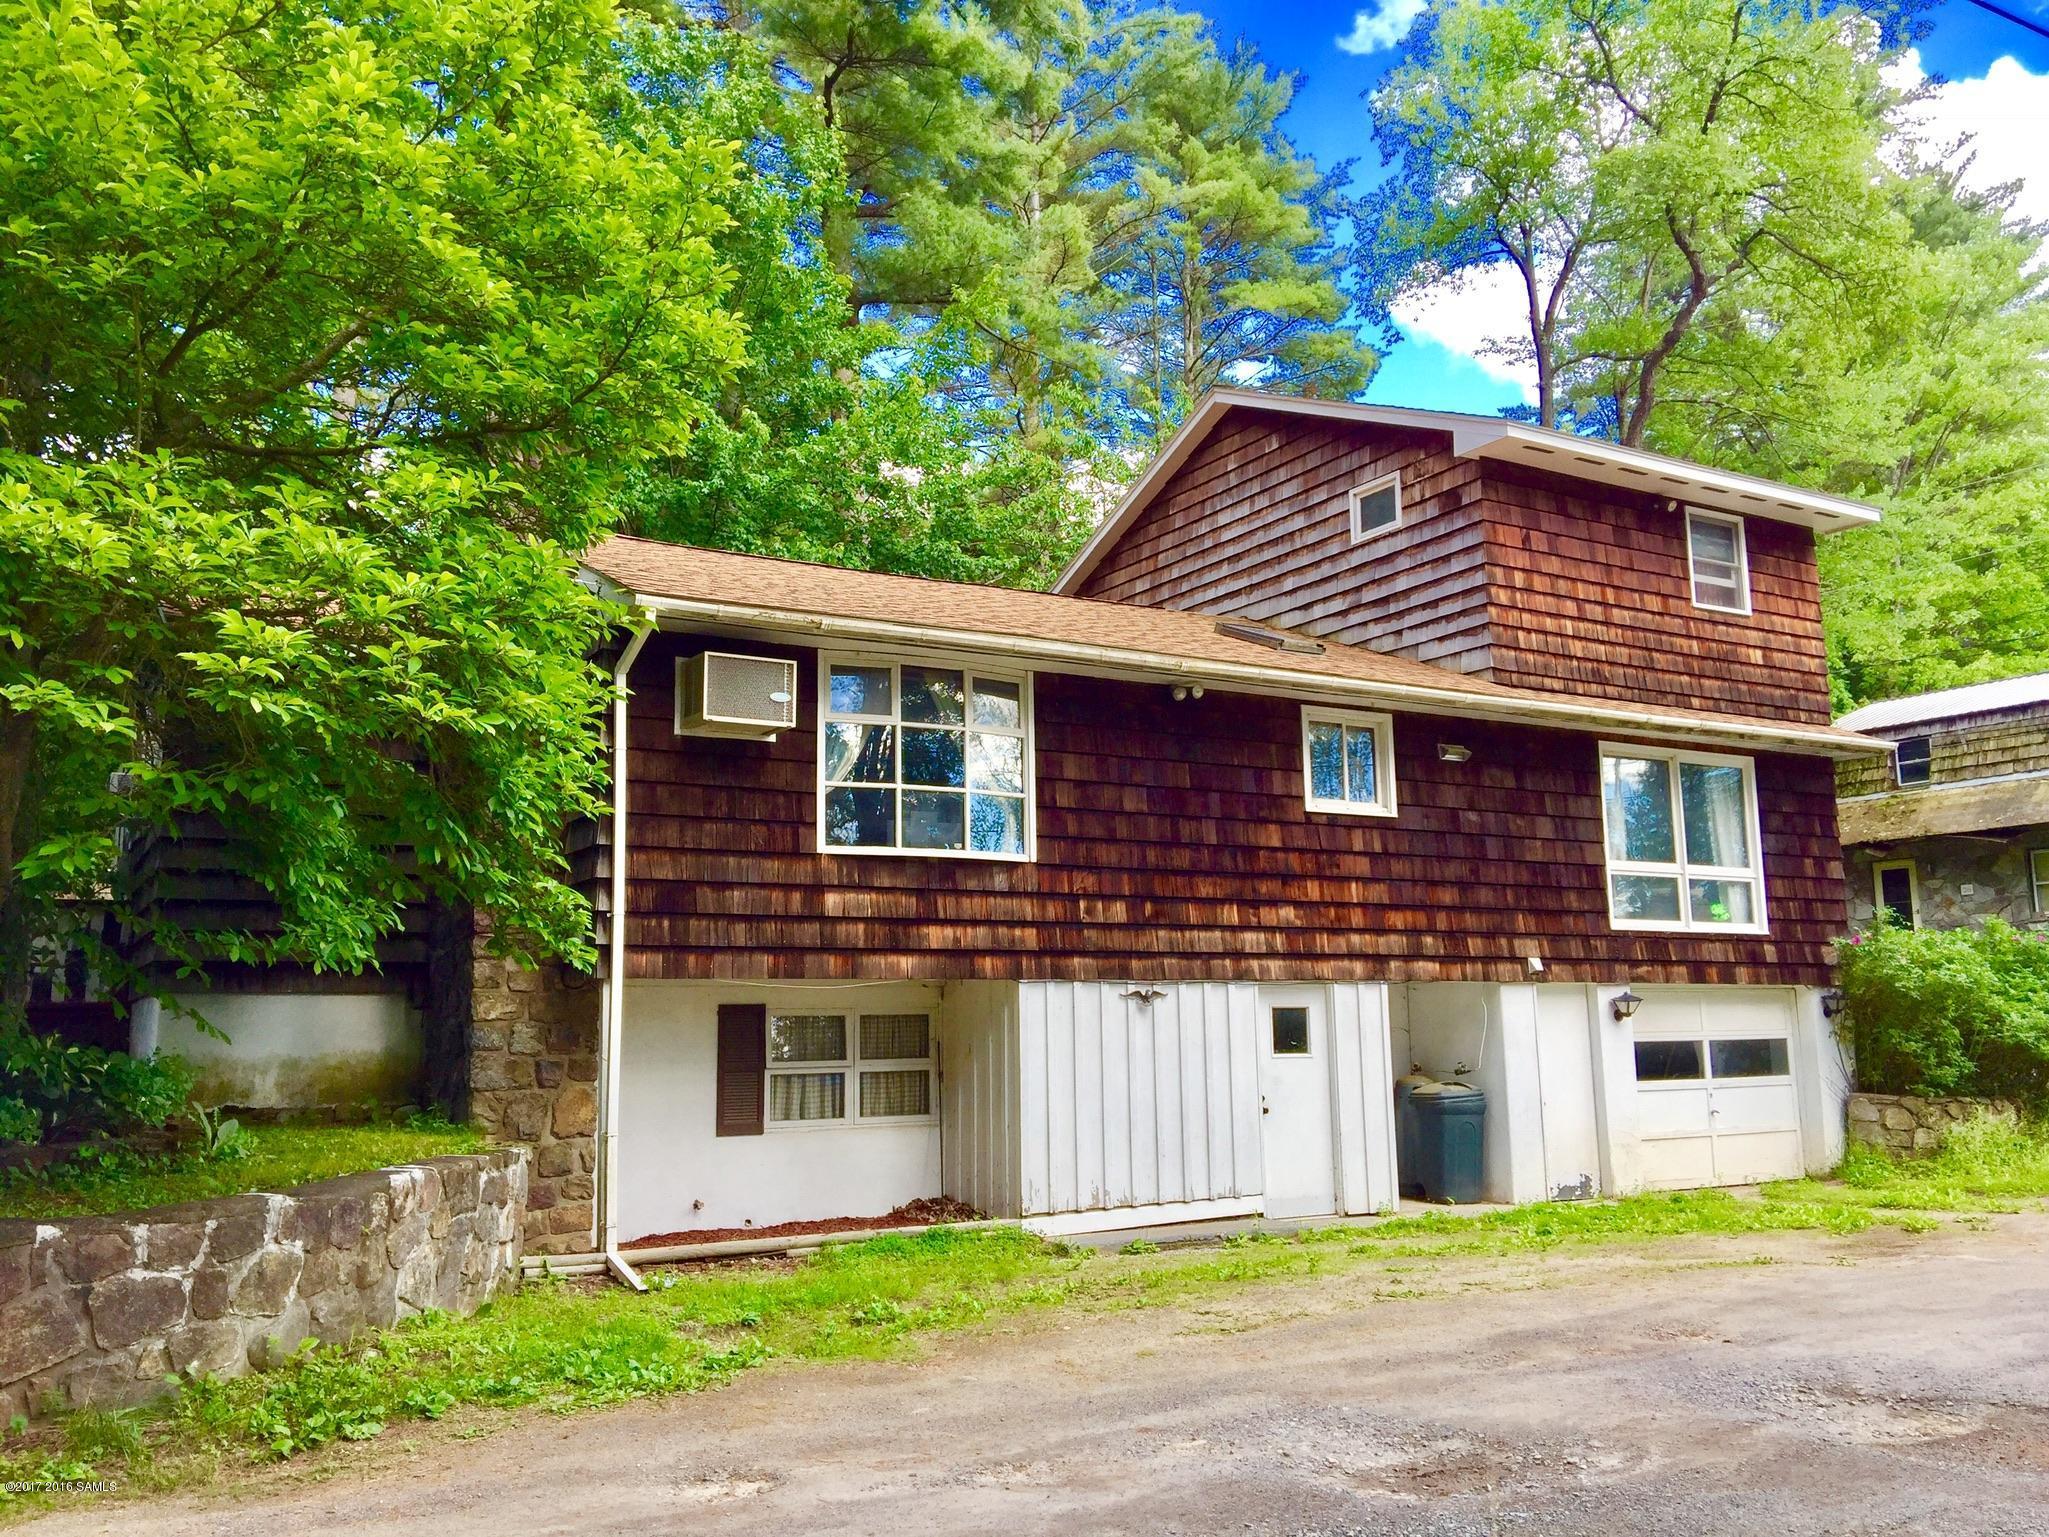 19 Gage Hill Drive, Lake Luzerne, NY 12846